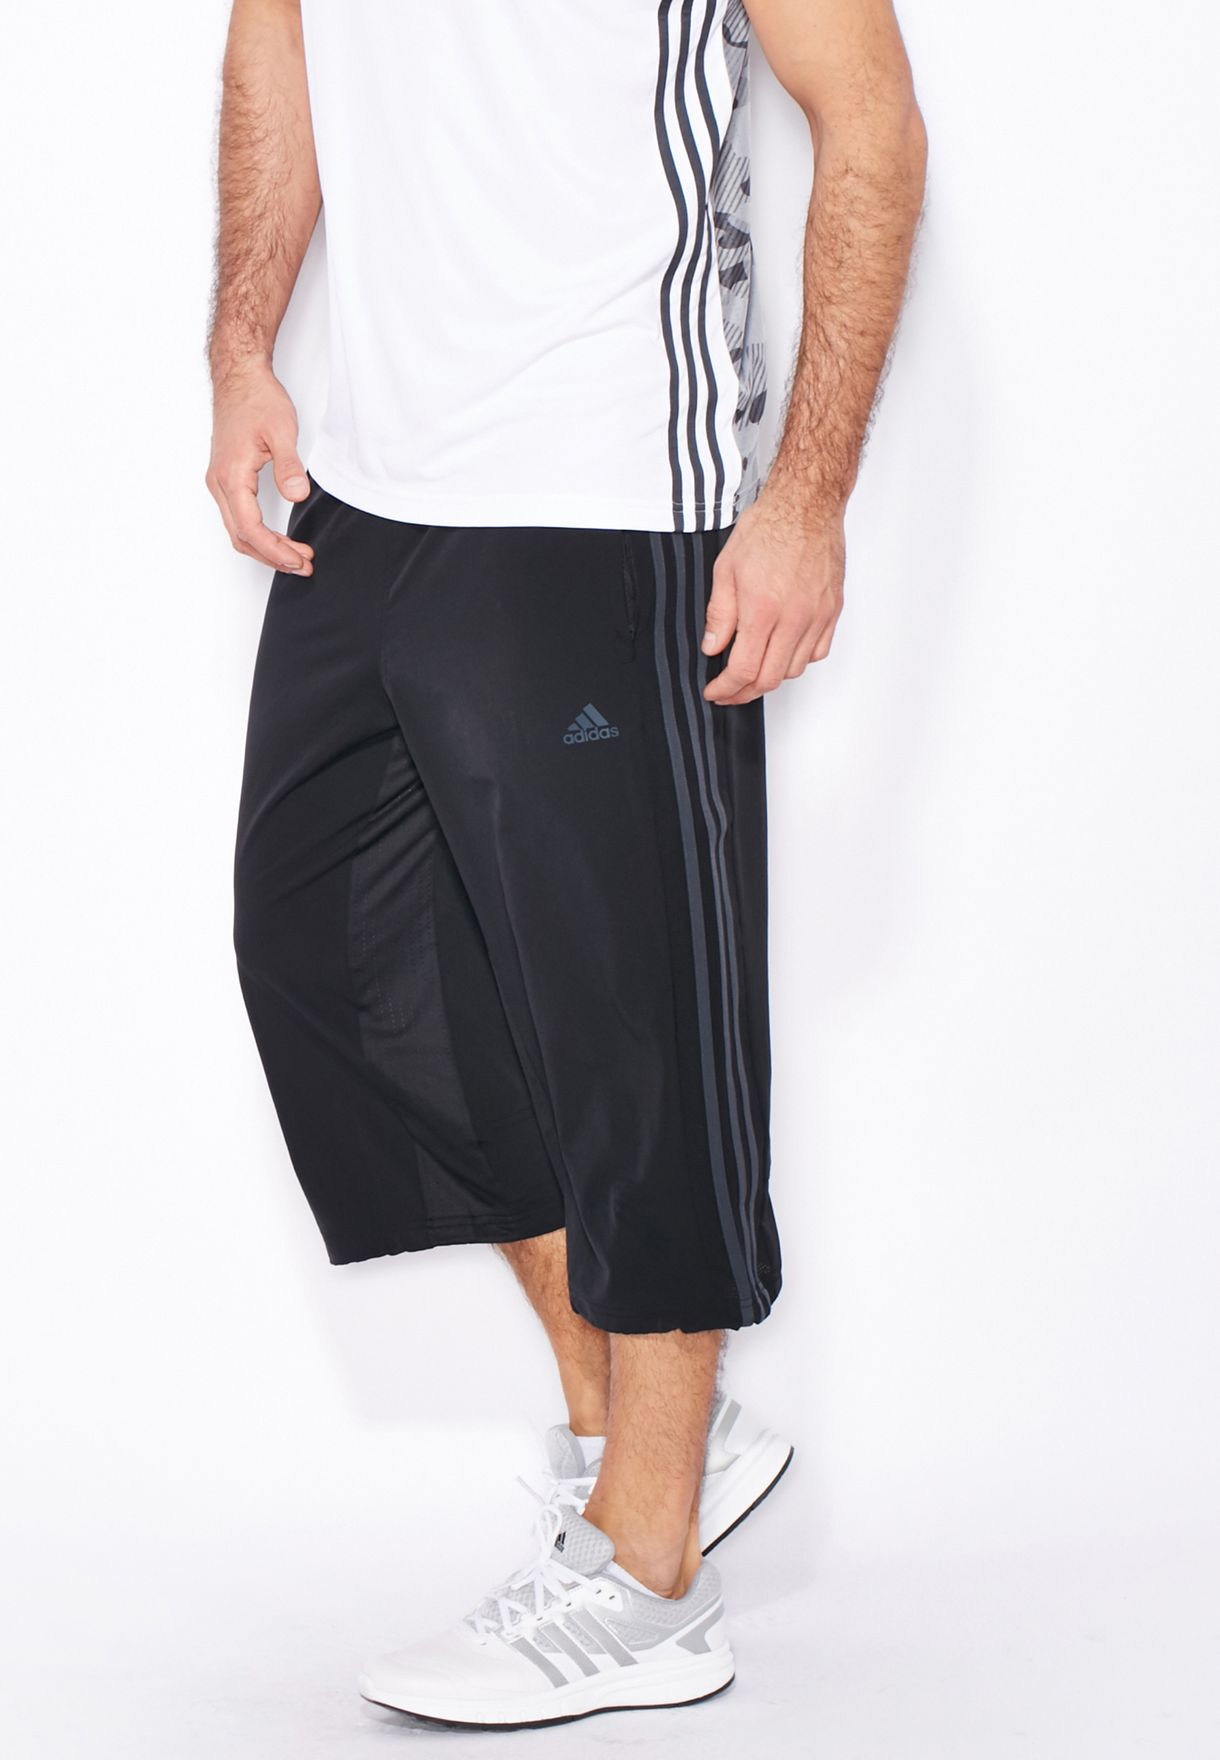 7335d16deb1a Shop adidas black Cool 365 3 4 Pants AJ5521 for Men in UAE ...